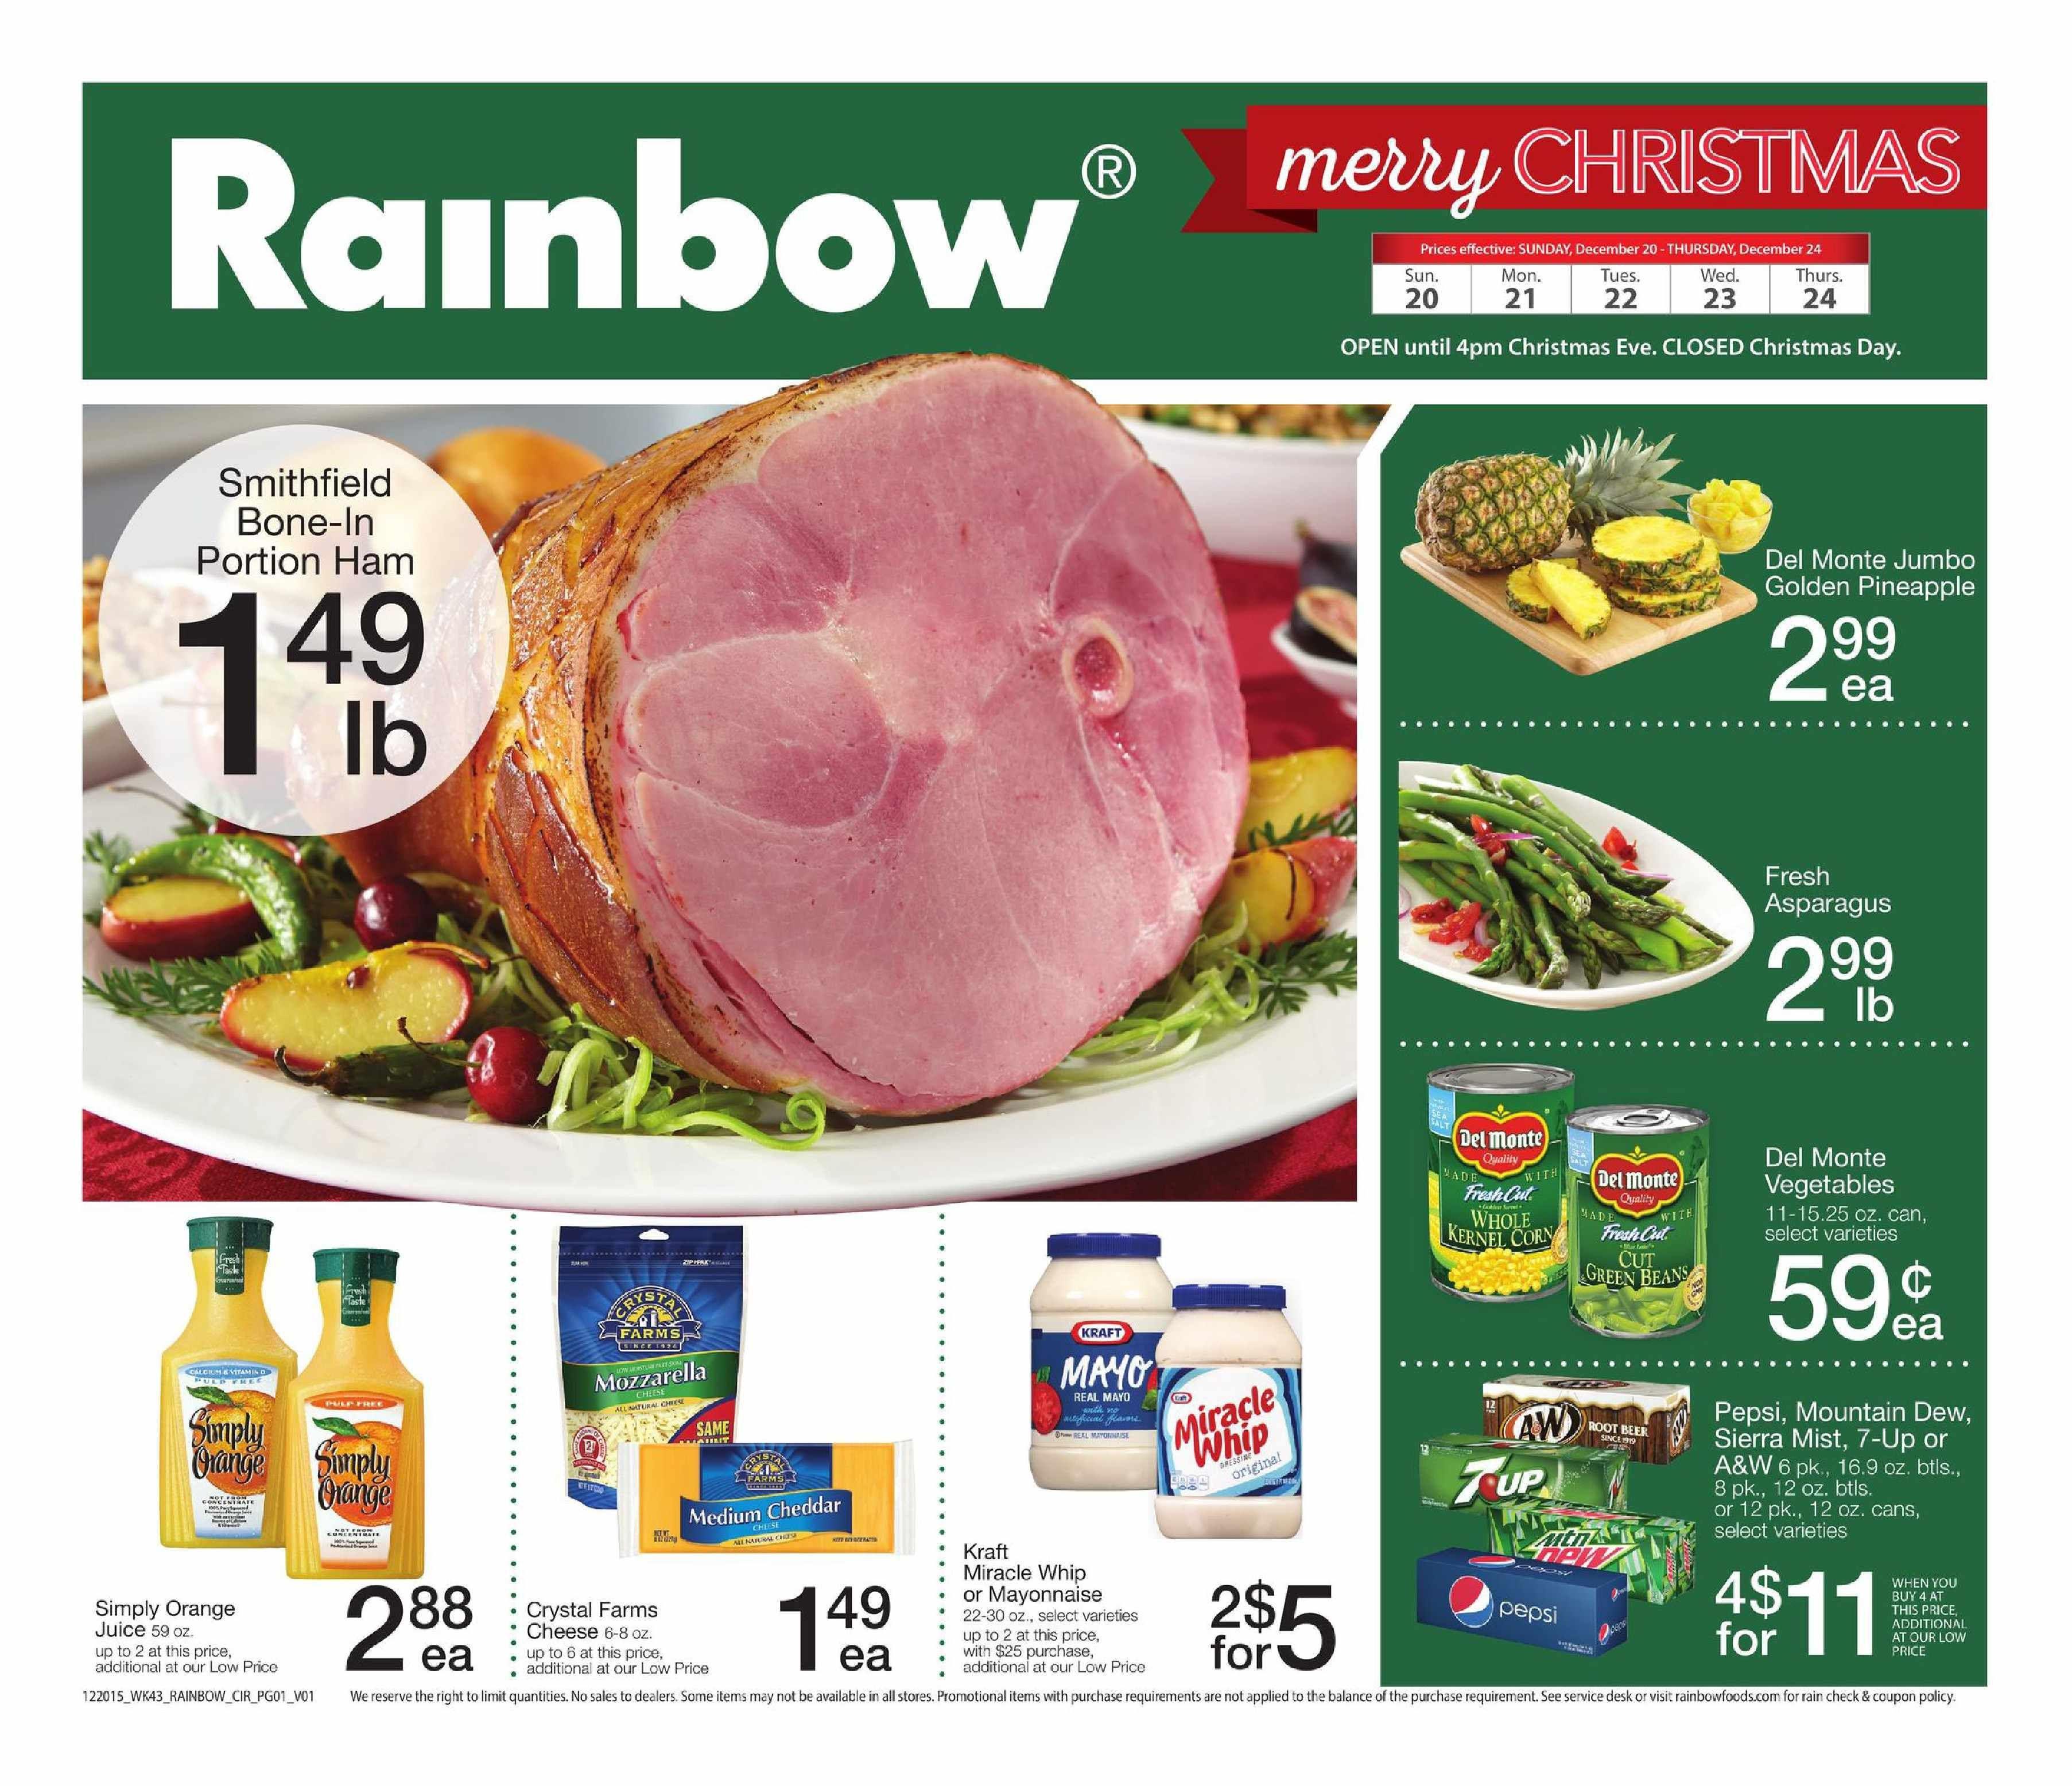 Rainbow Flyer Dec 20 - 24, 2015 - http://www.kaitalog.com/rainbow-weekly-ad.html